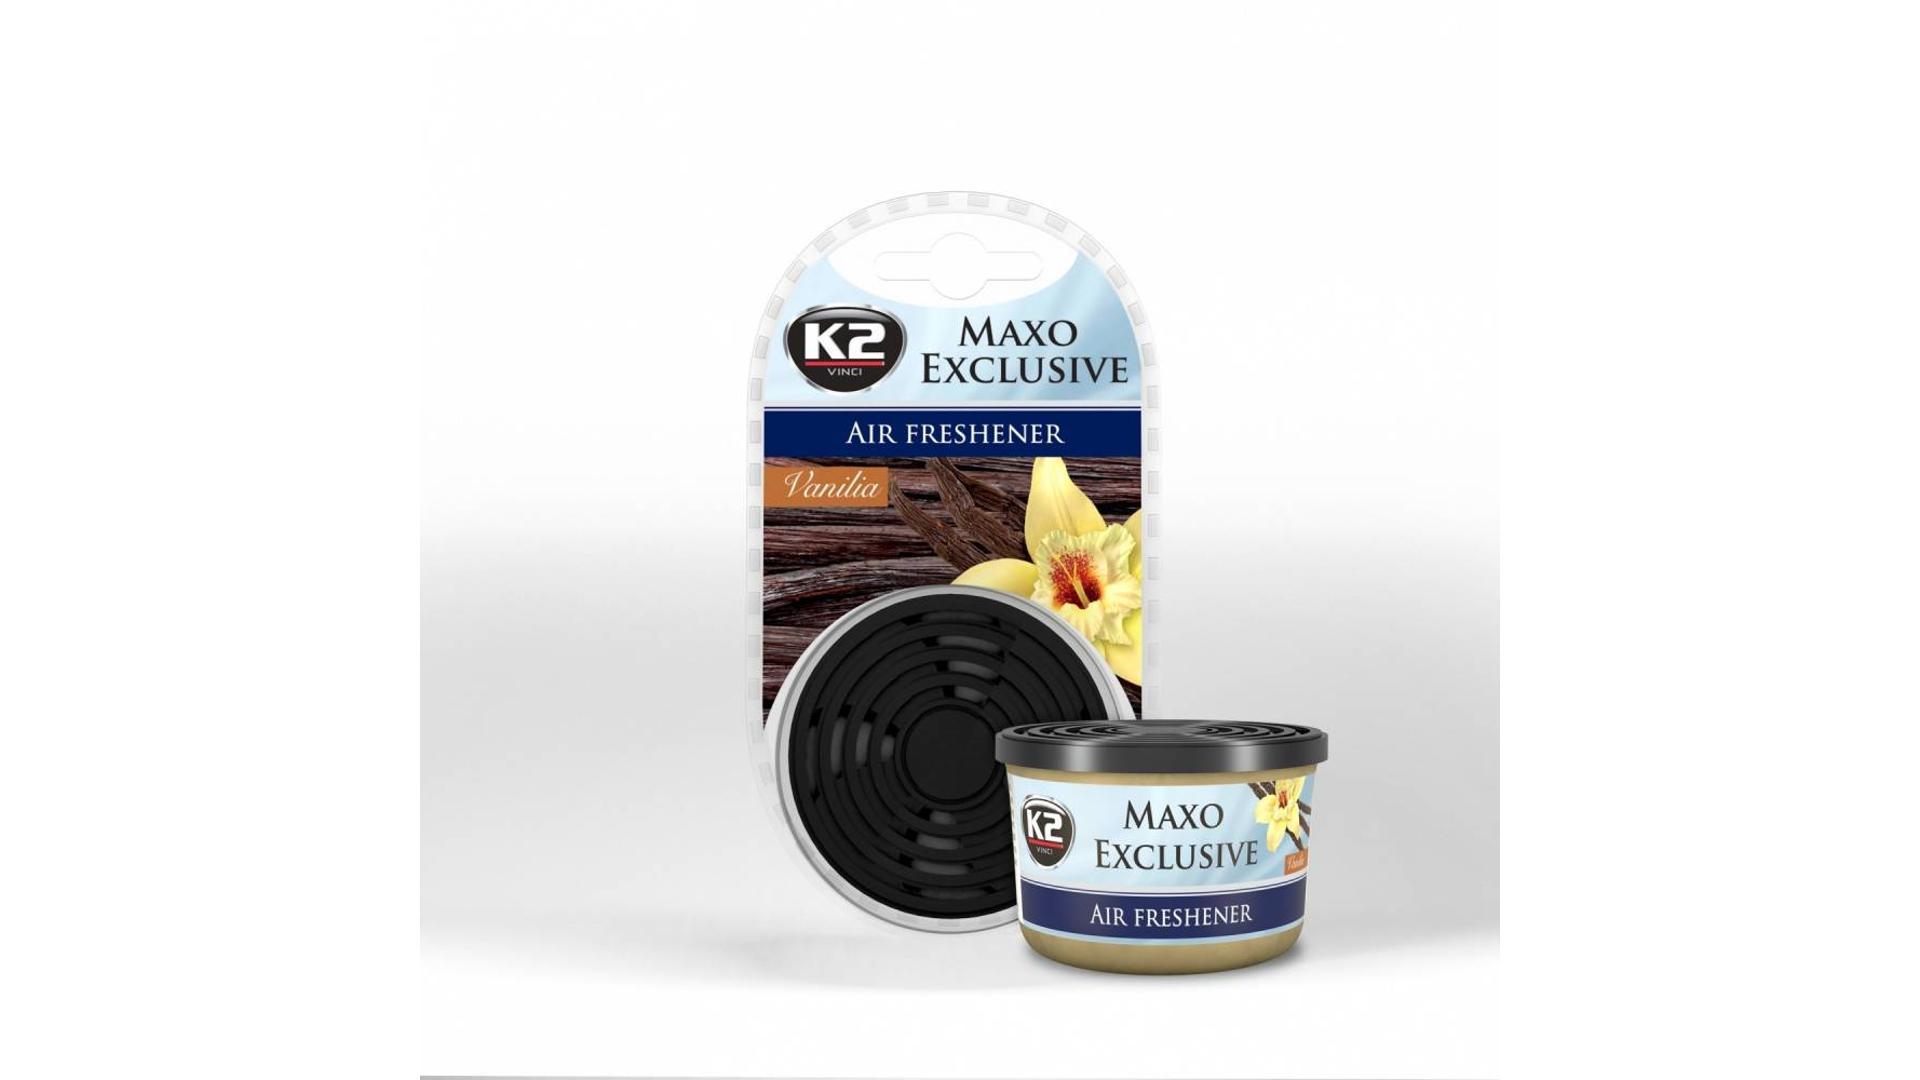 K2 MAXO EXCLUSIVE 45g VANILIA